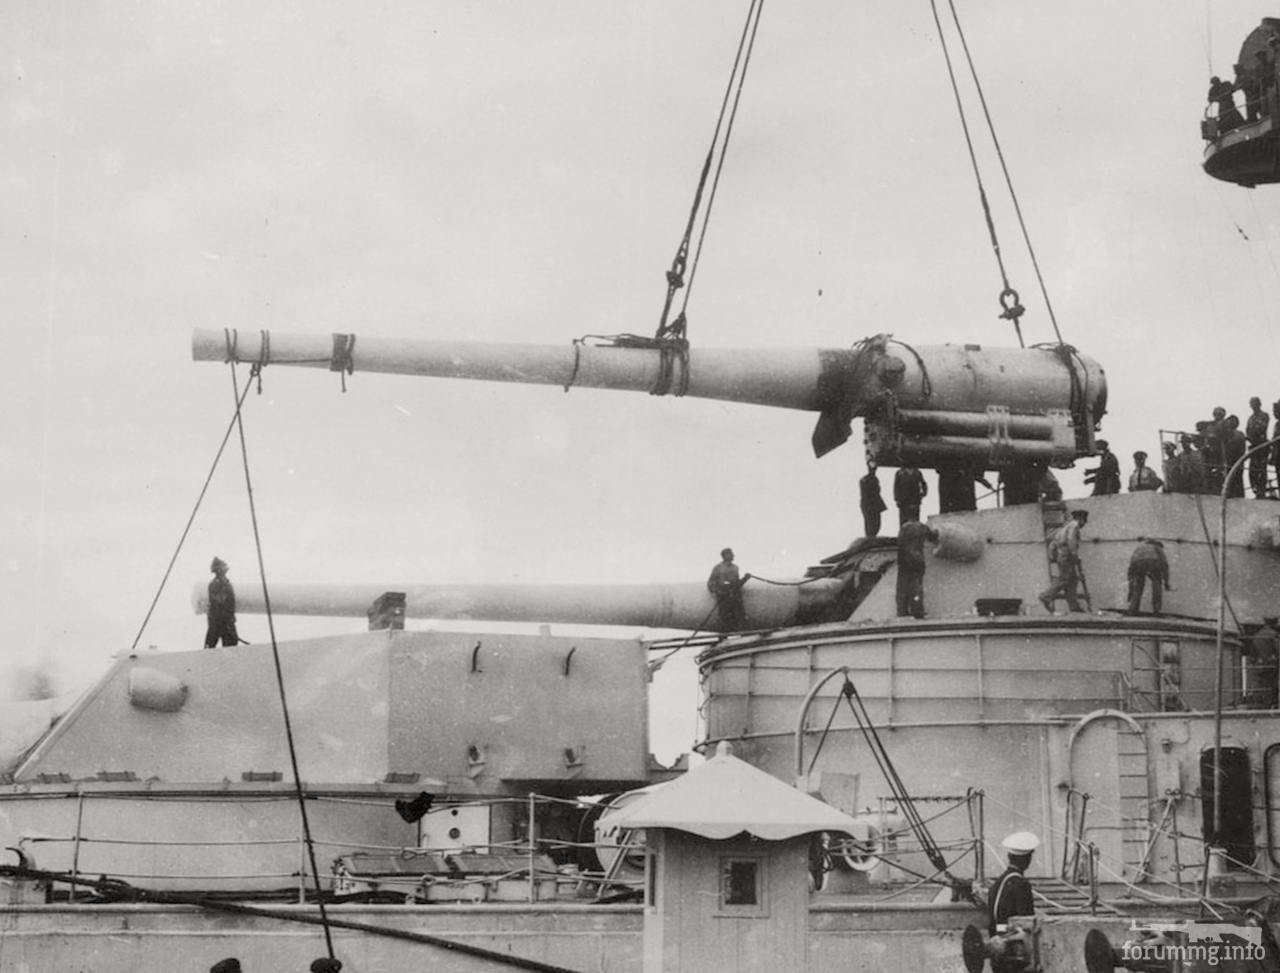 133736 - Замена орудия в башне аргентинского линкора Moreno, 6 апреля 1946 г.